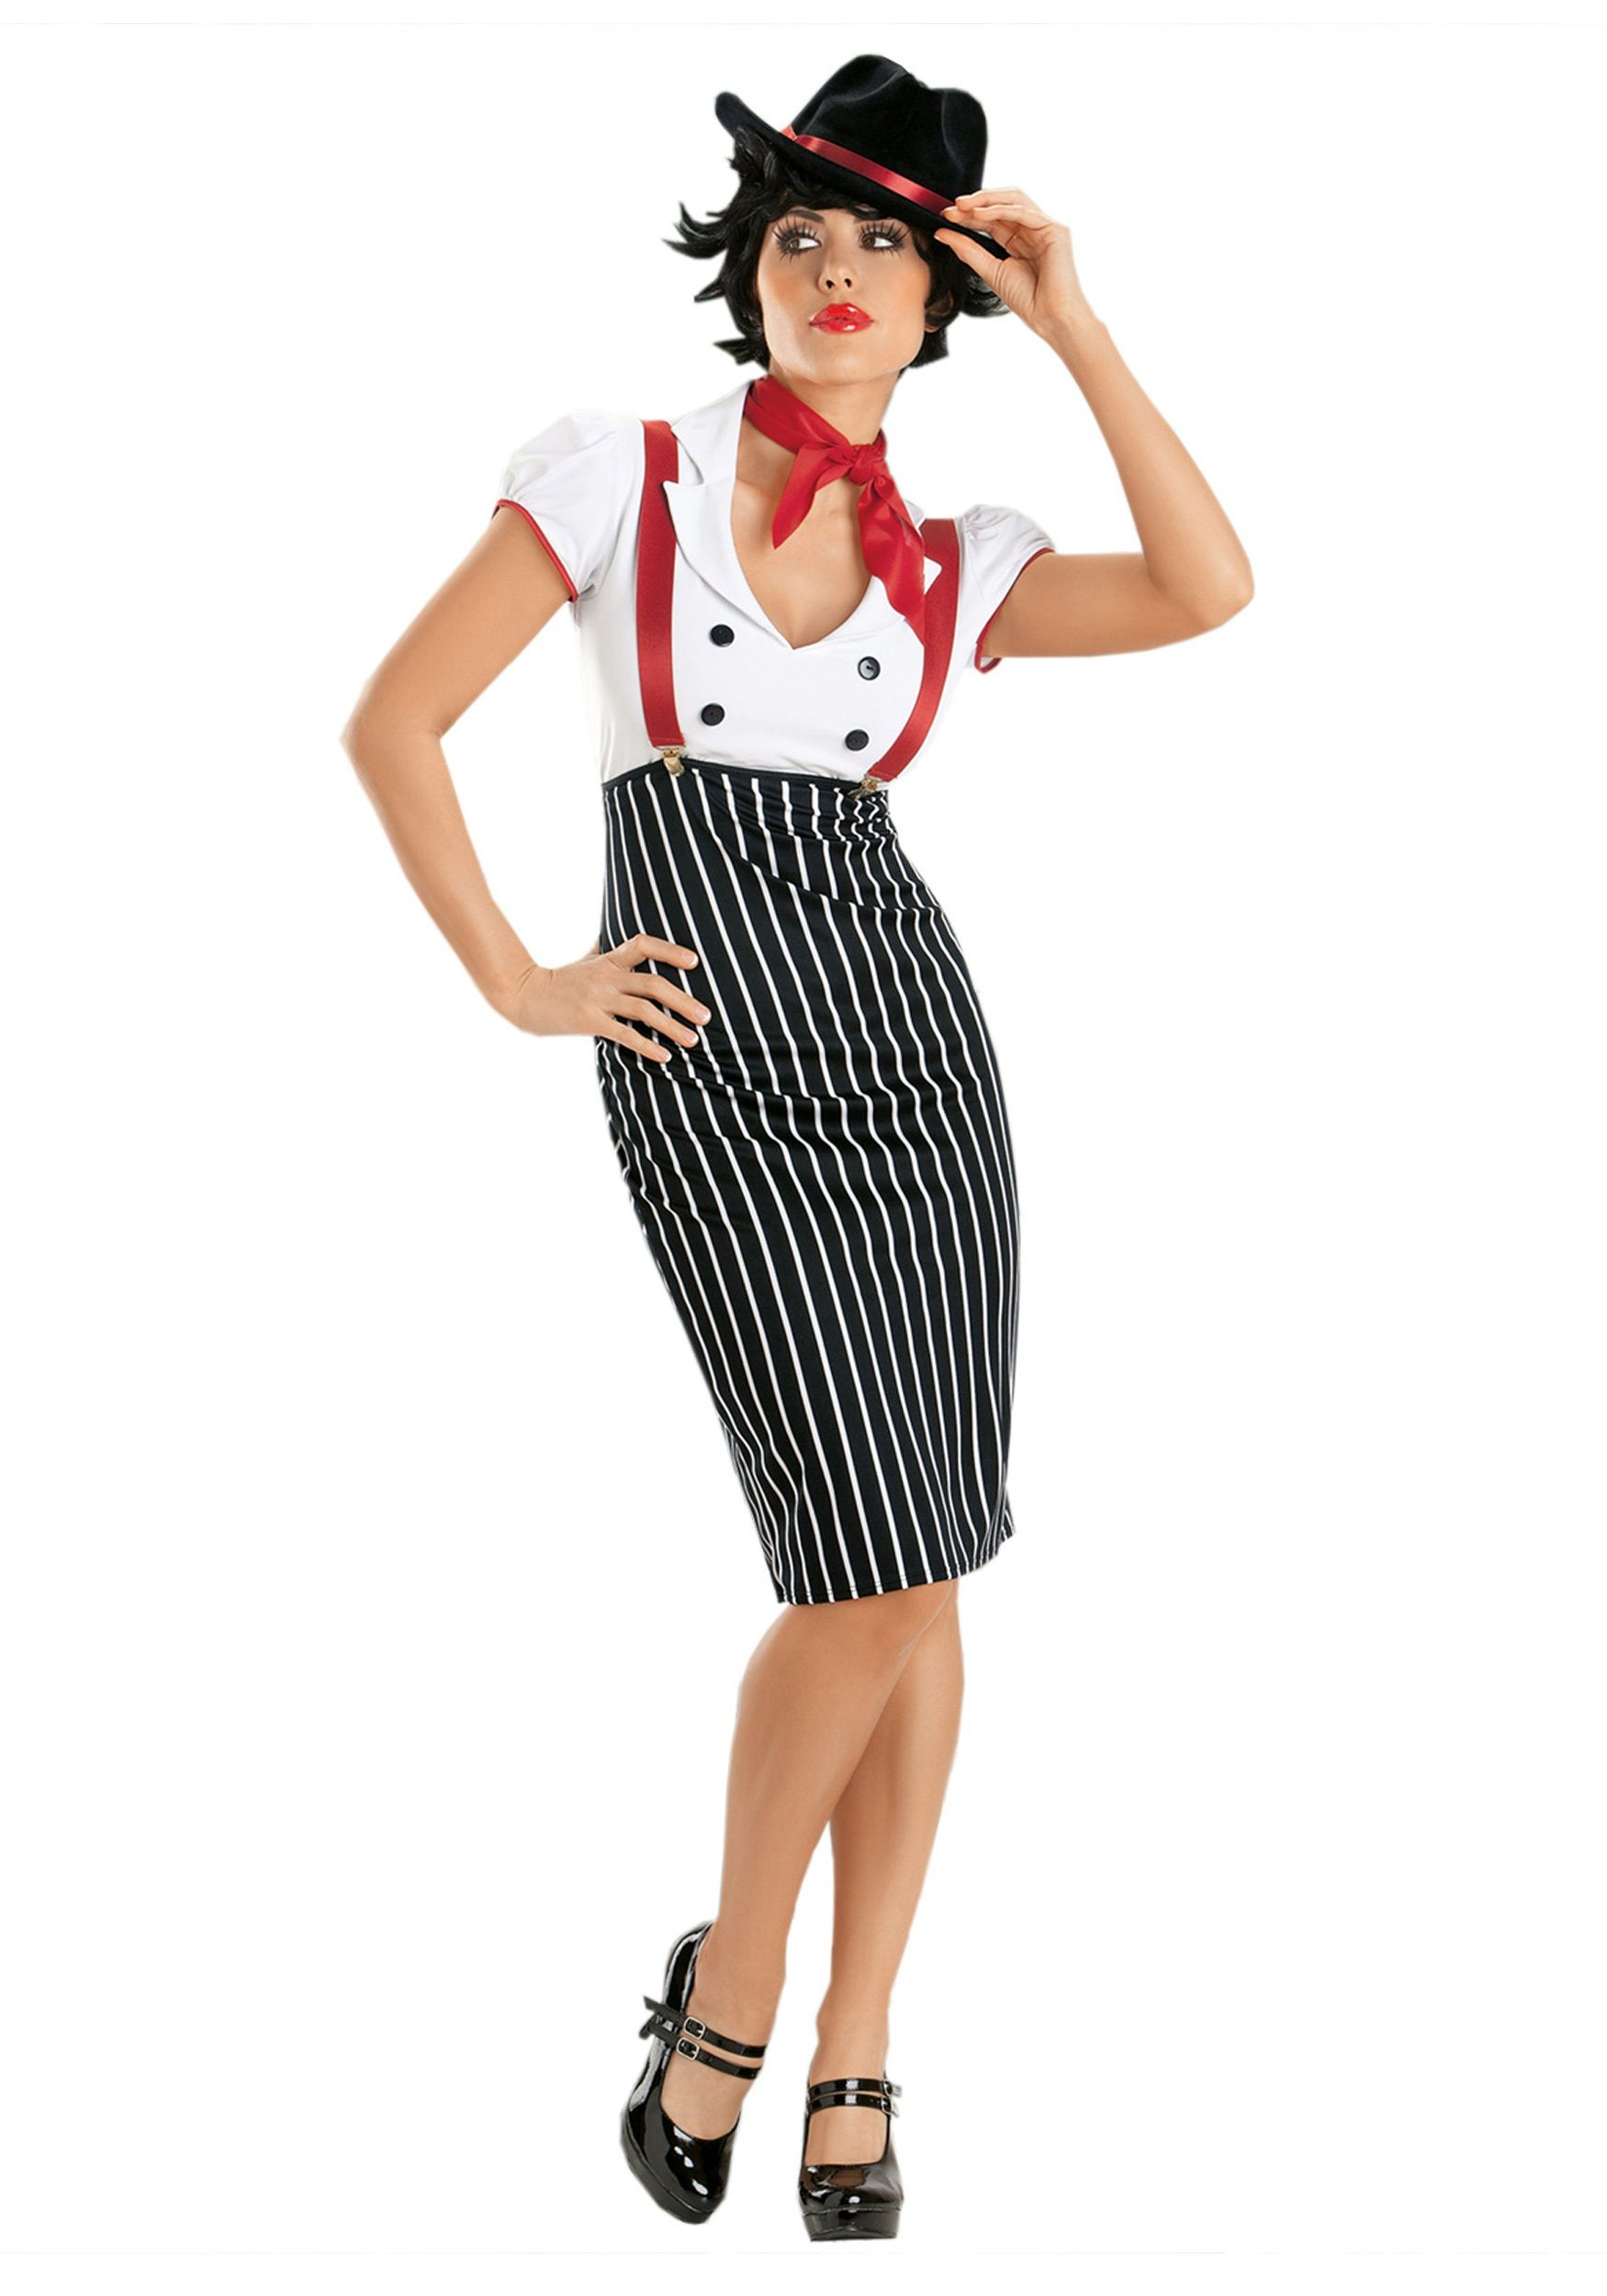 cb6414f958729 women gangster costume